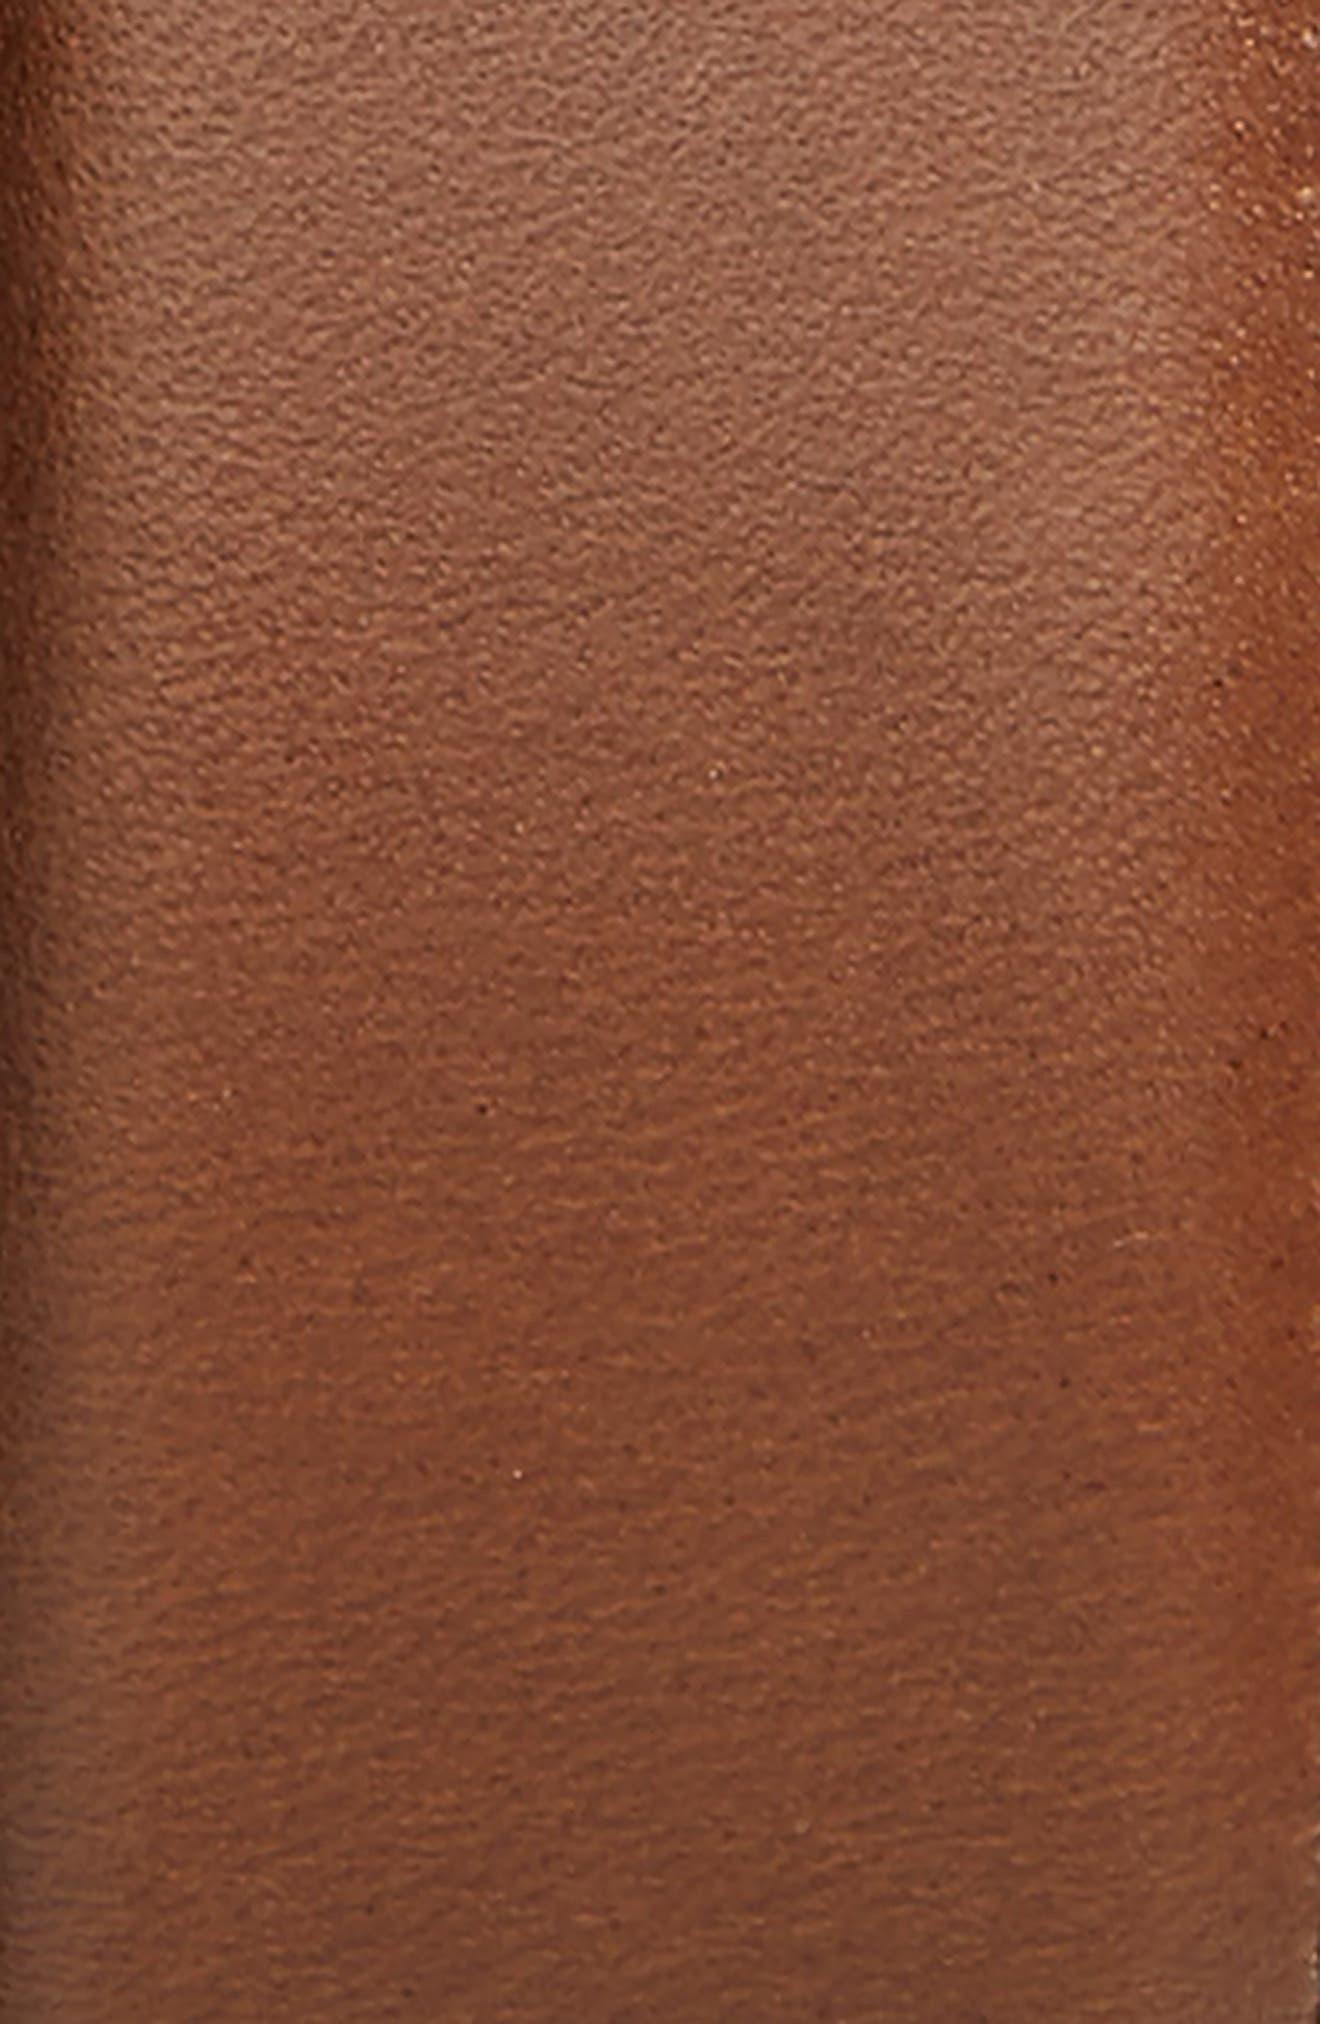 Parker Leather Belt,                             Alternate thumbnail 10, color,